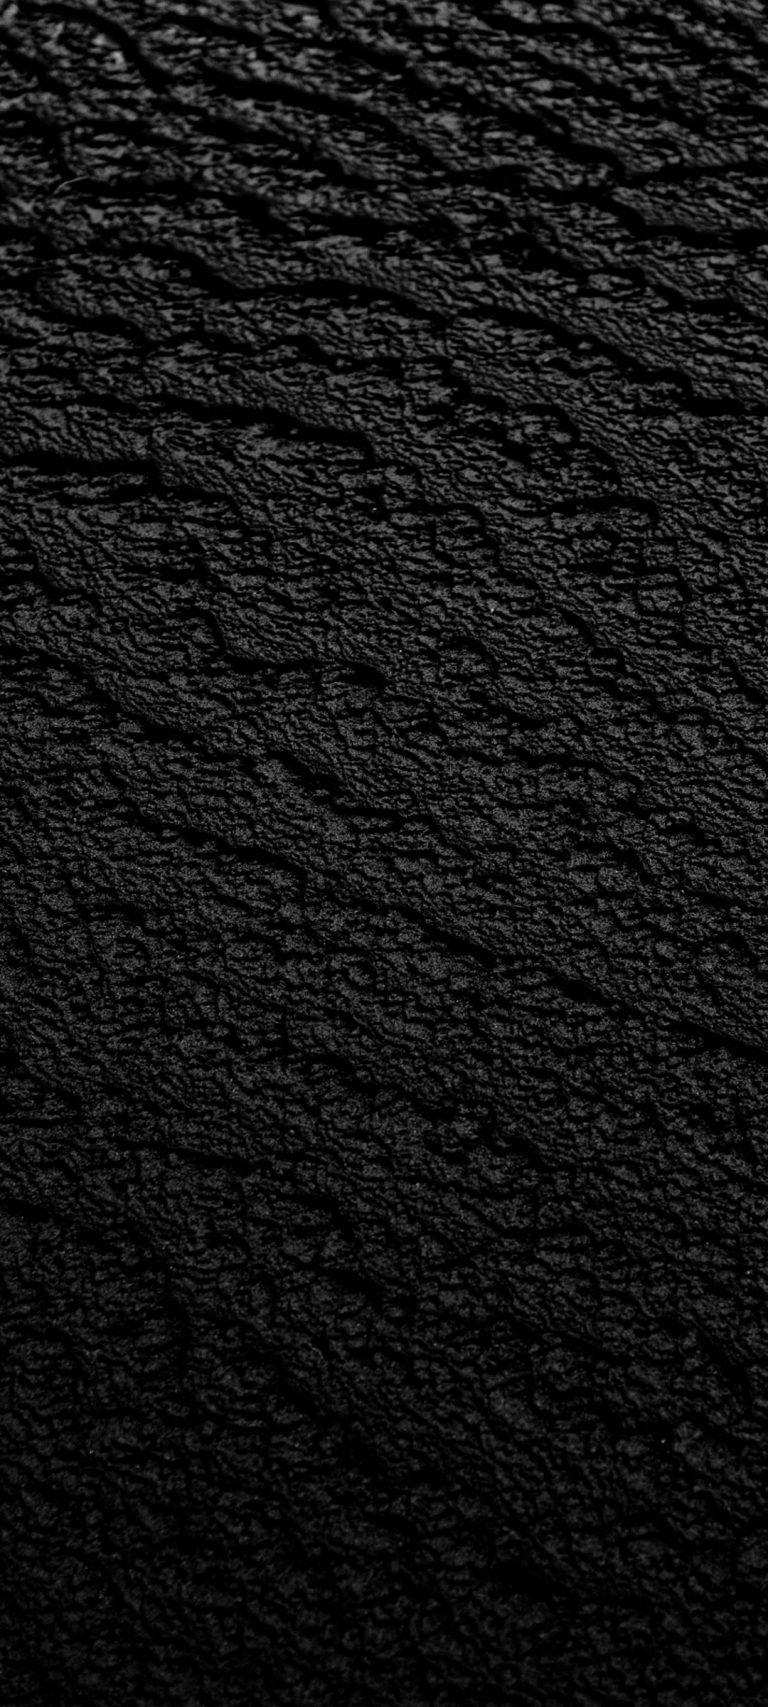 Black Surface Texture 1080x2400 768x1707